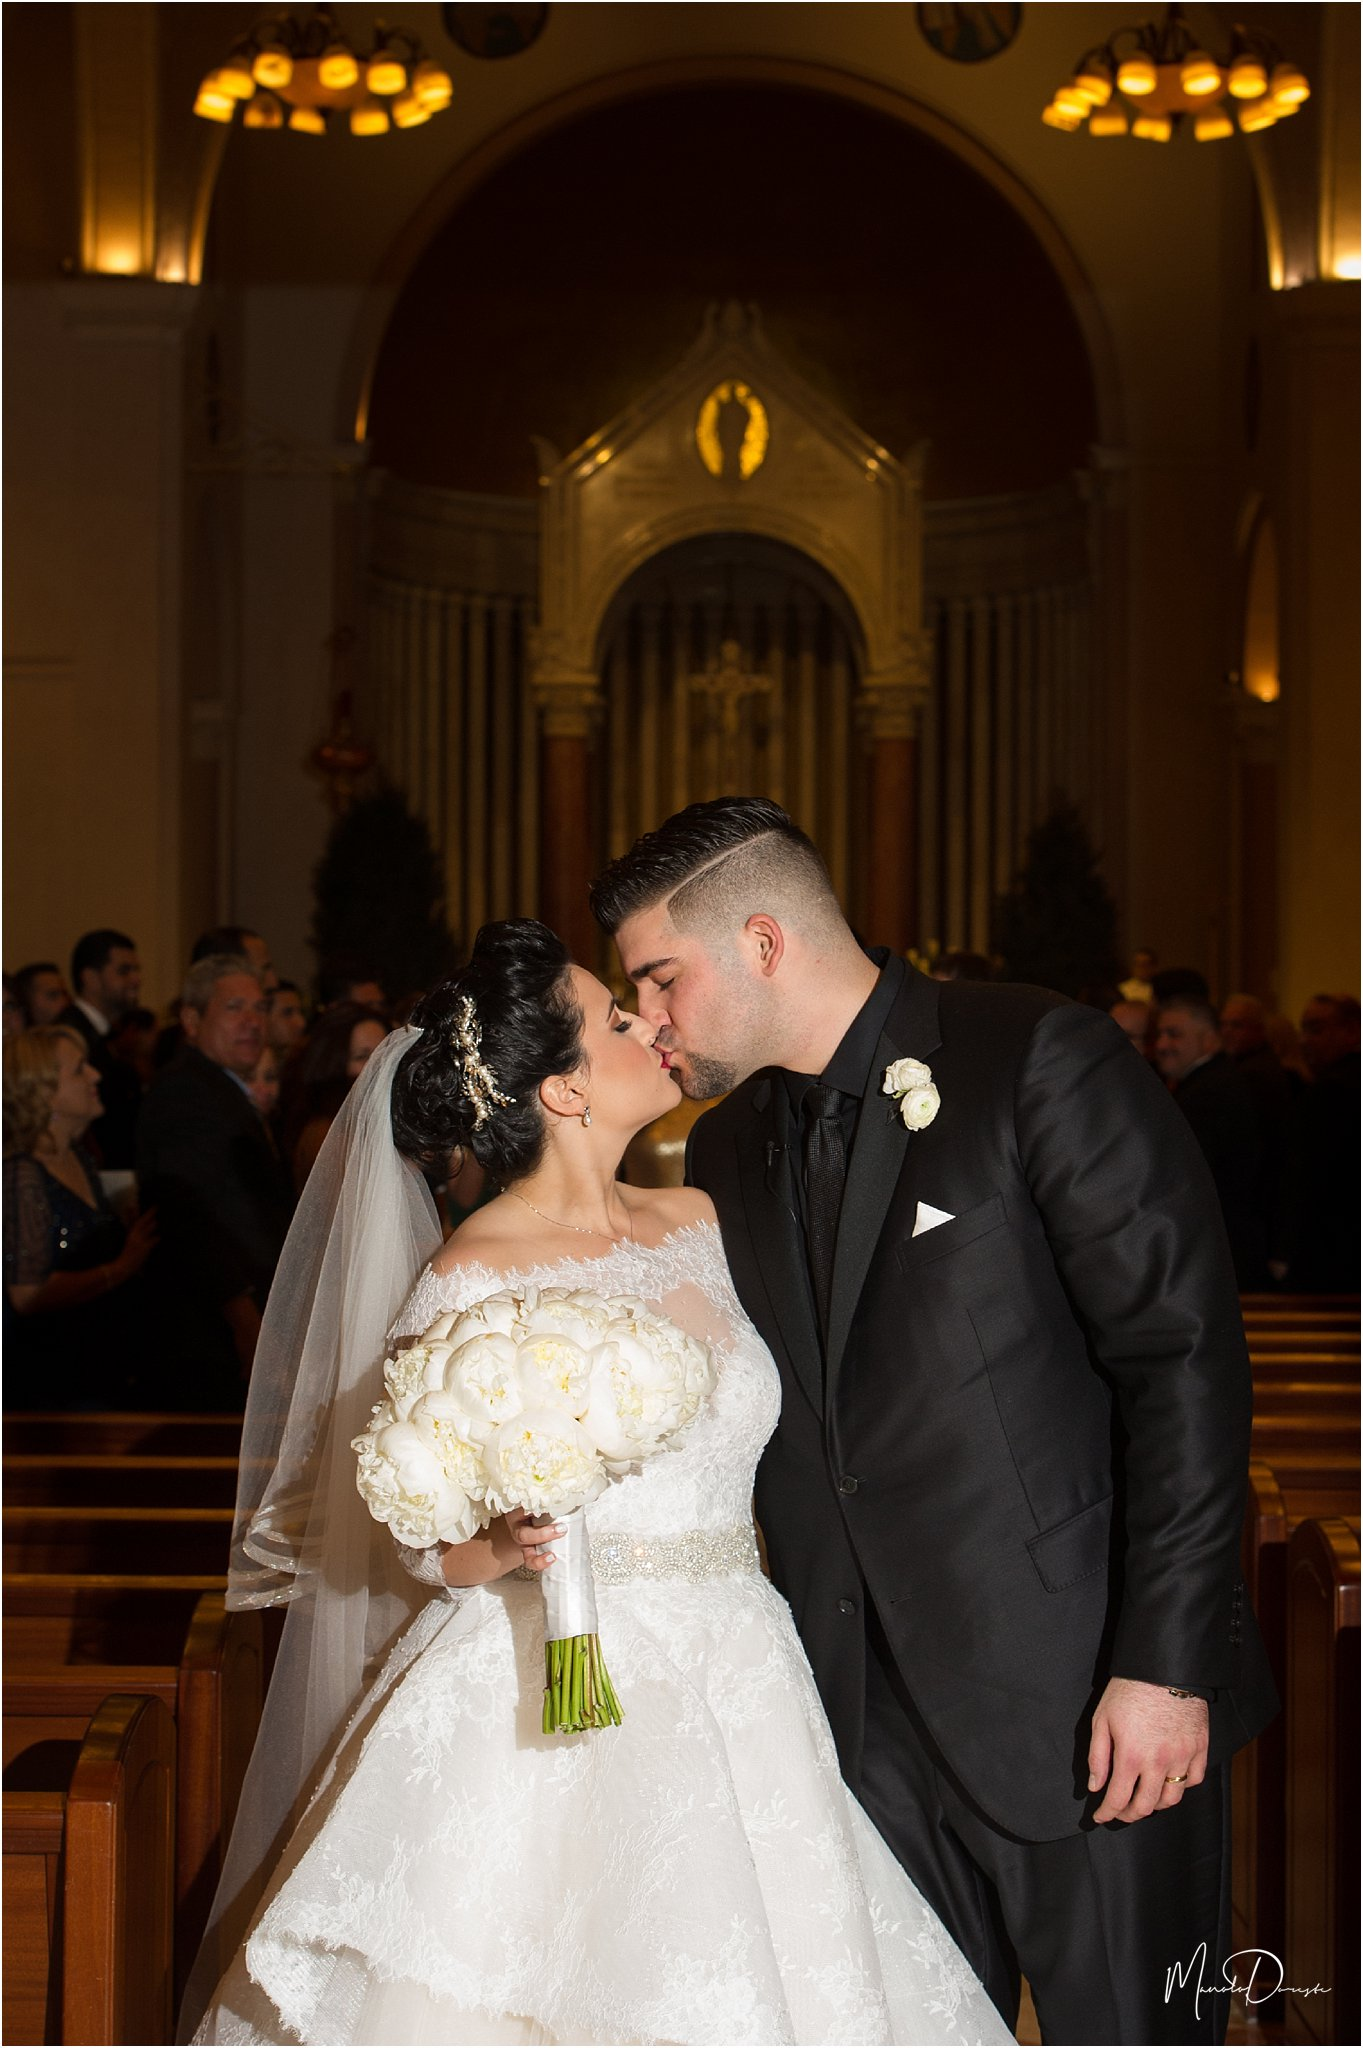 00963_ManoloDoreste_InFocusStudios_Wedding_Family_Photography_Miami_MiamiPhotographer.jpg